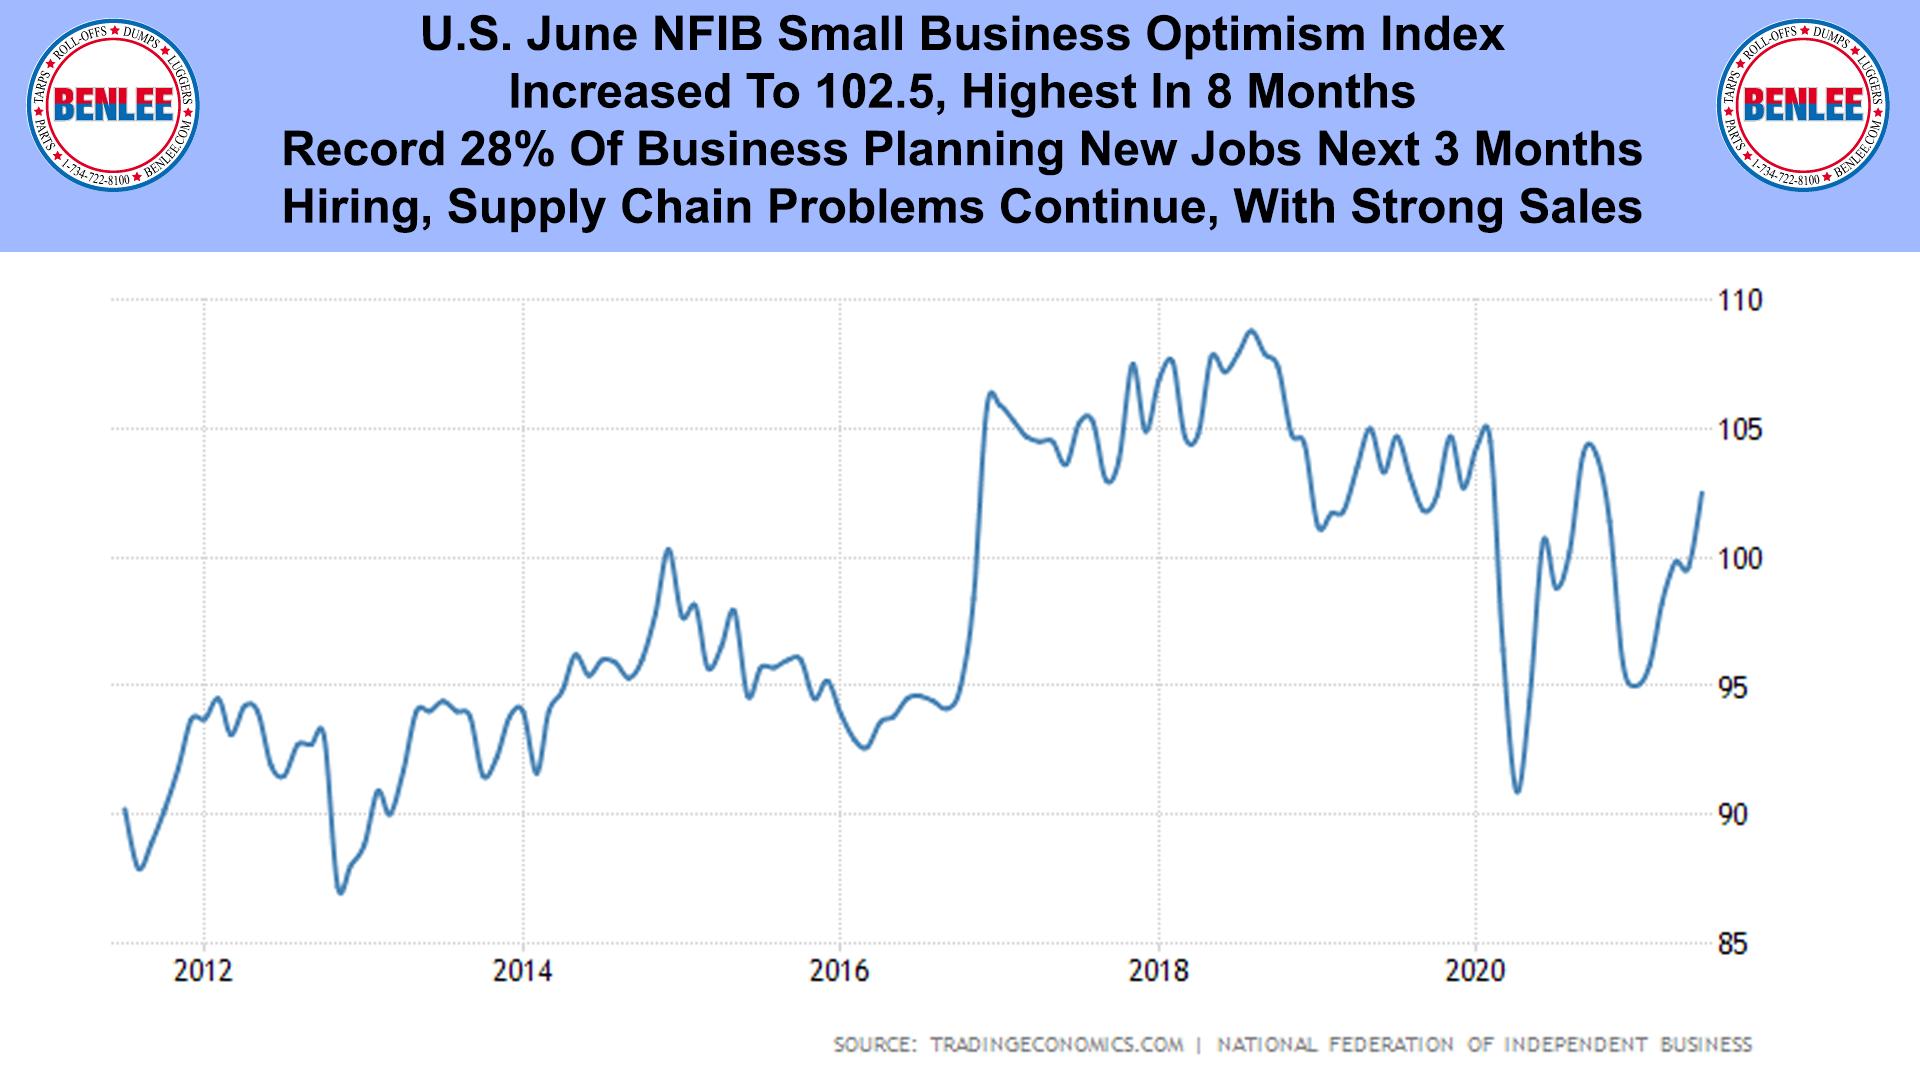 U.S. June NFIB Small Business Optimism Index